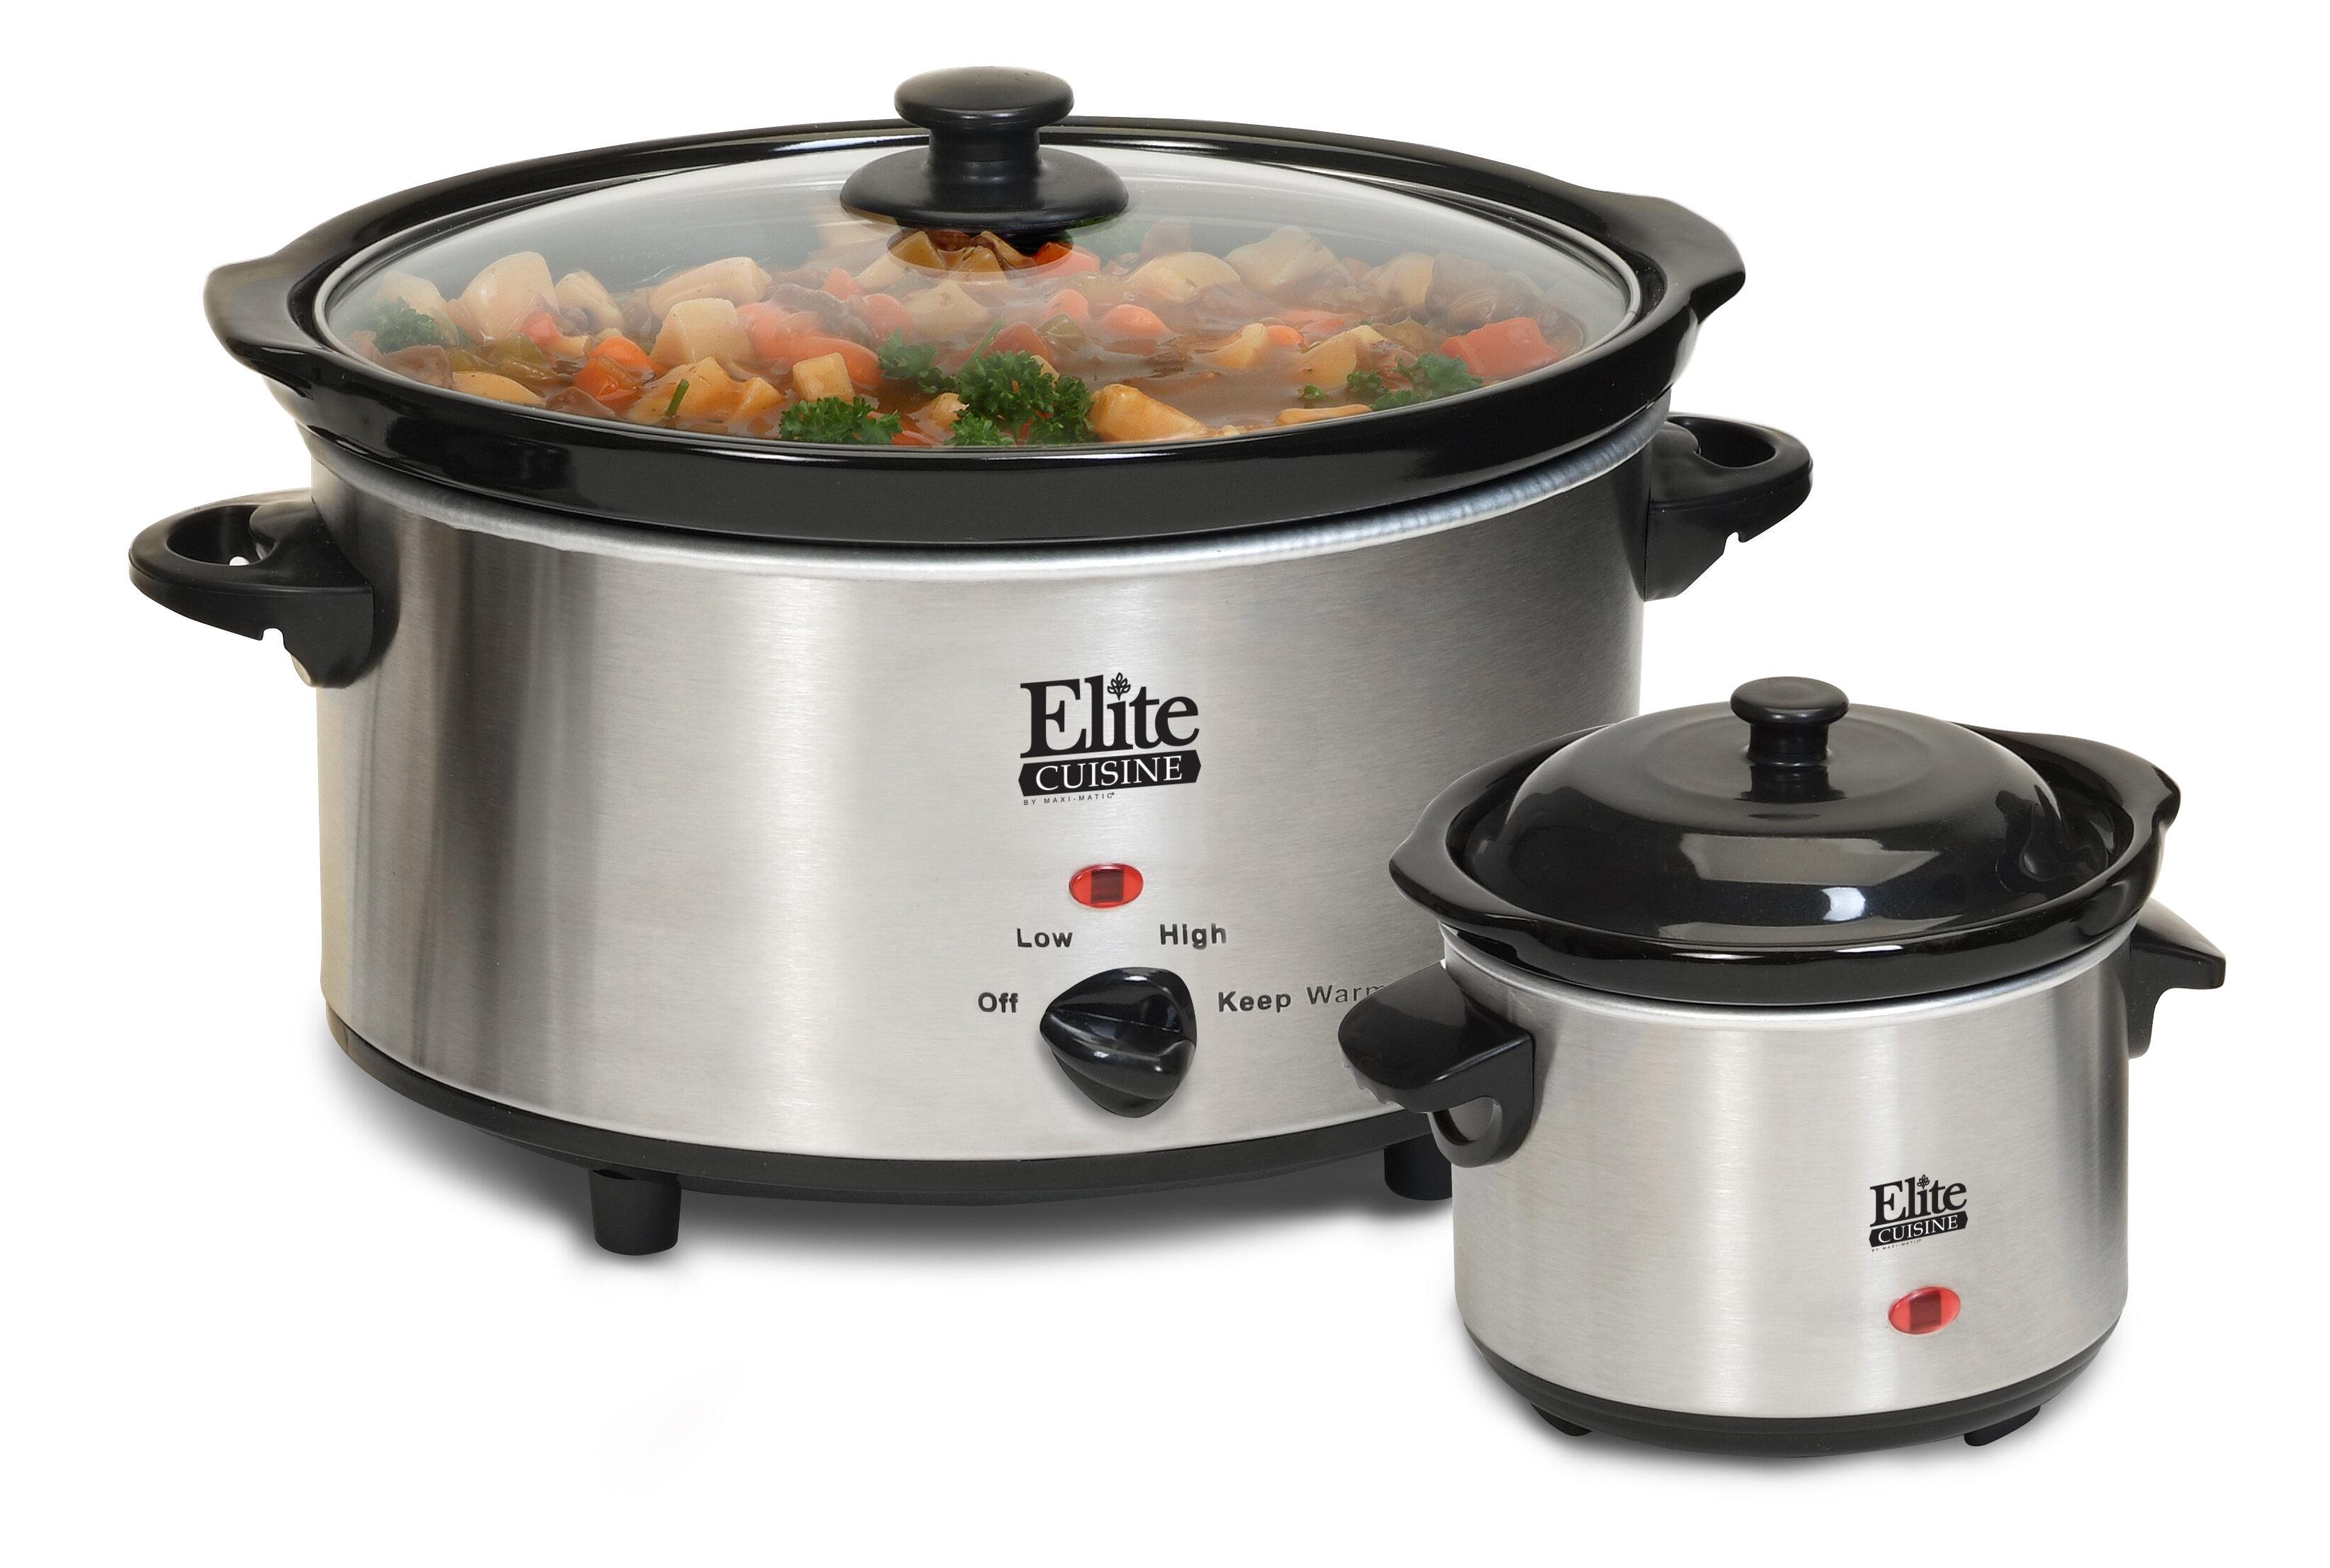 Elite by Maxi-Matic Cuisine 5-Quart Slow Cooker with Mini Dipper